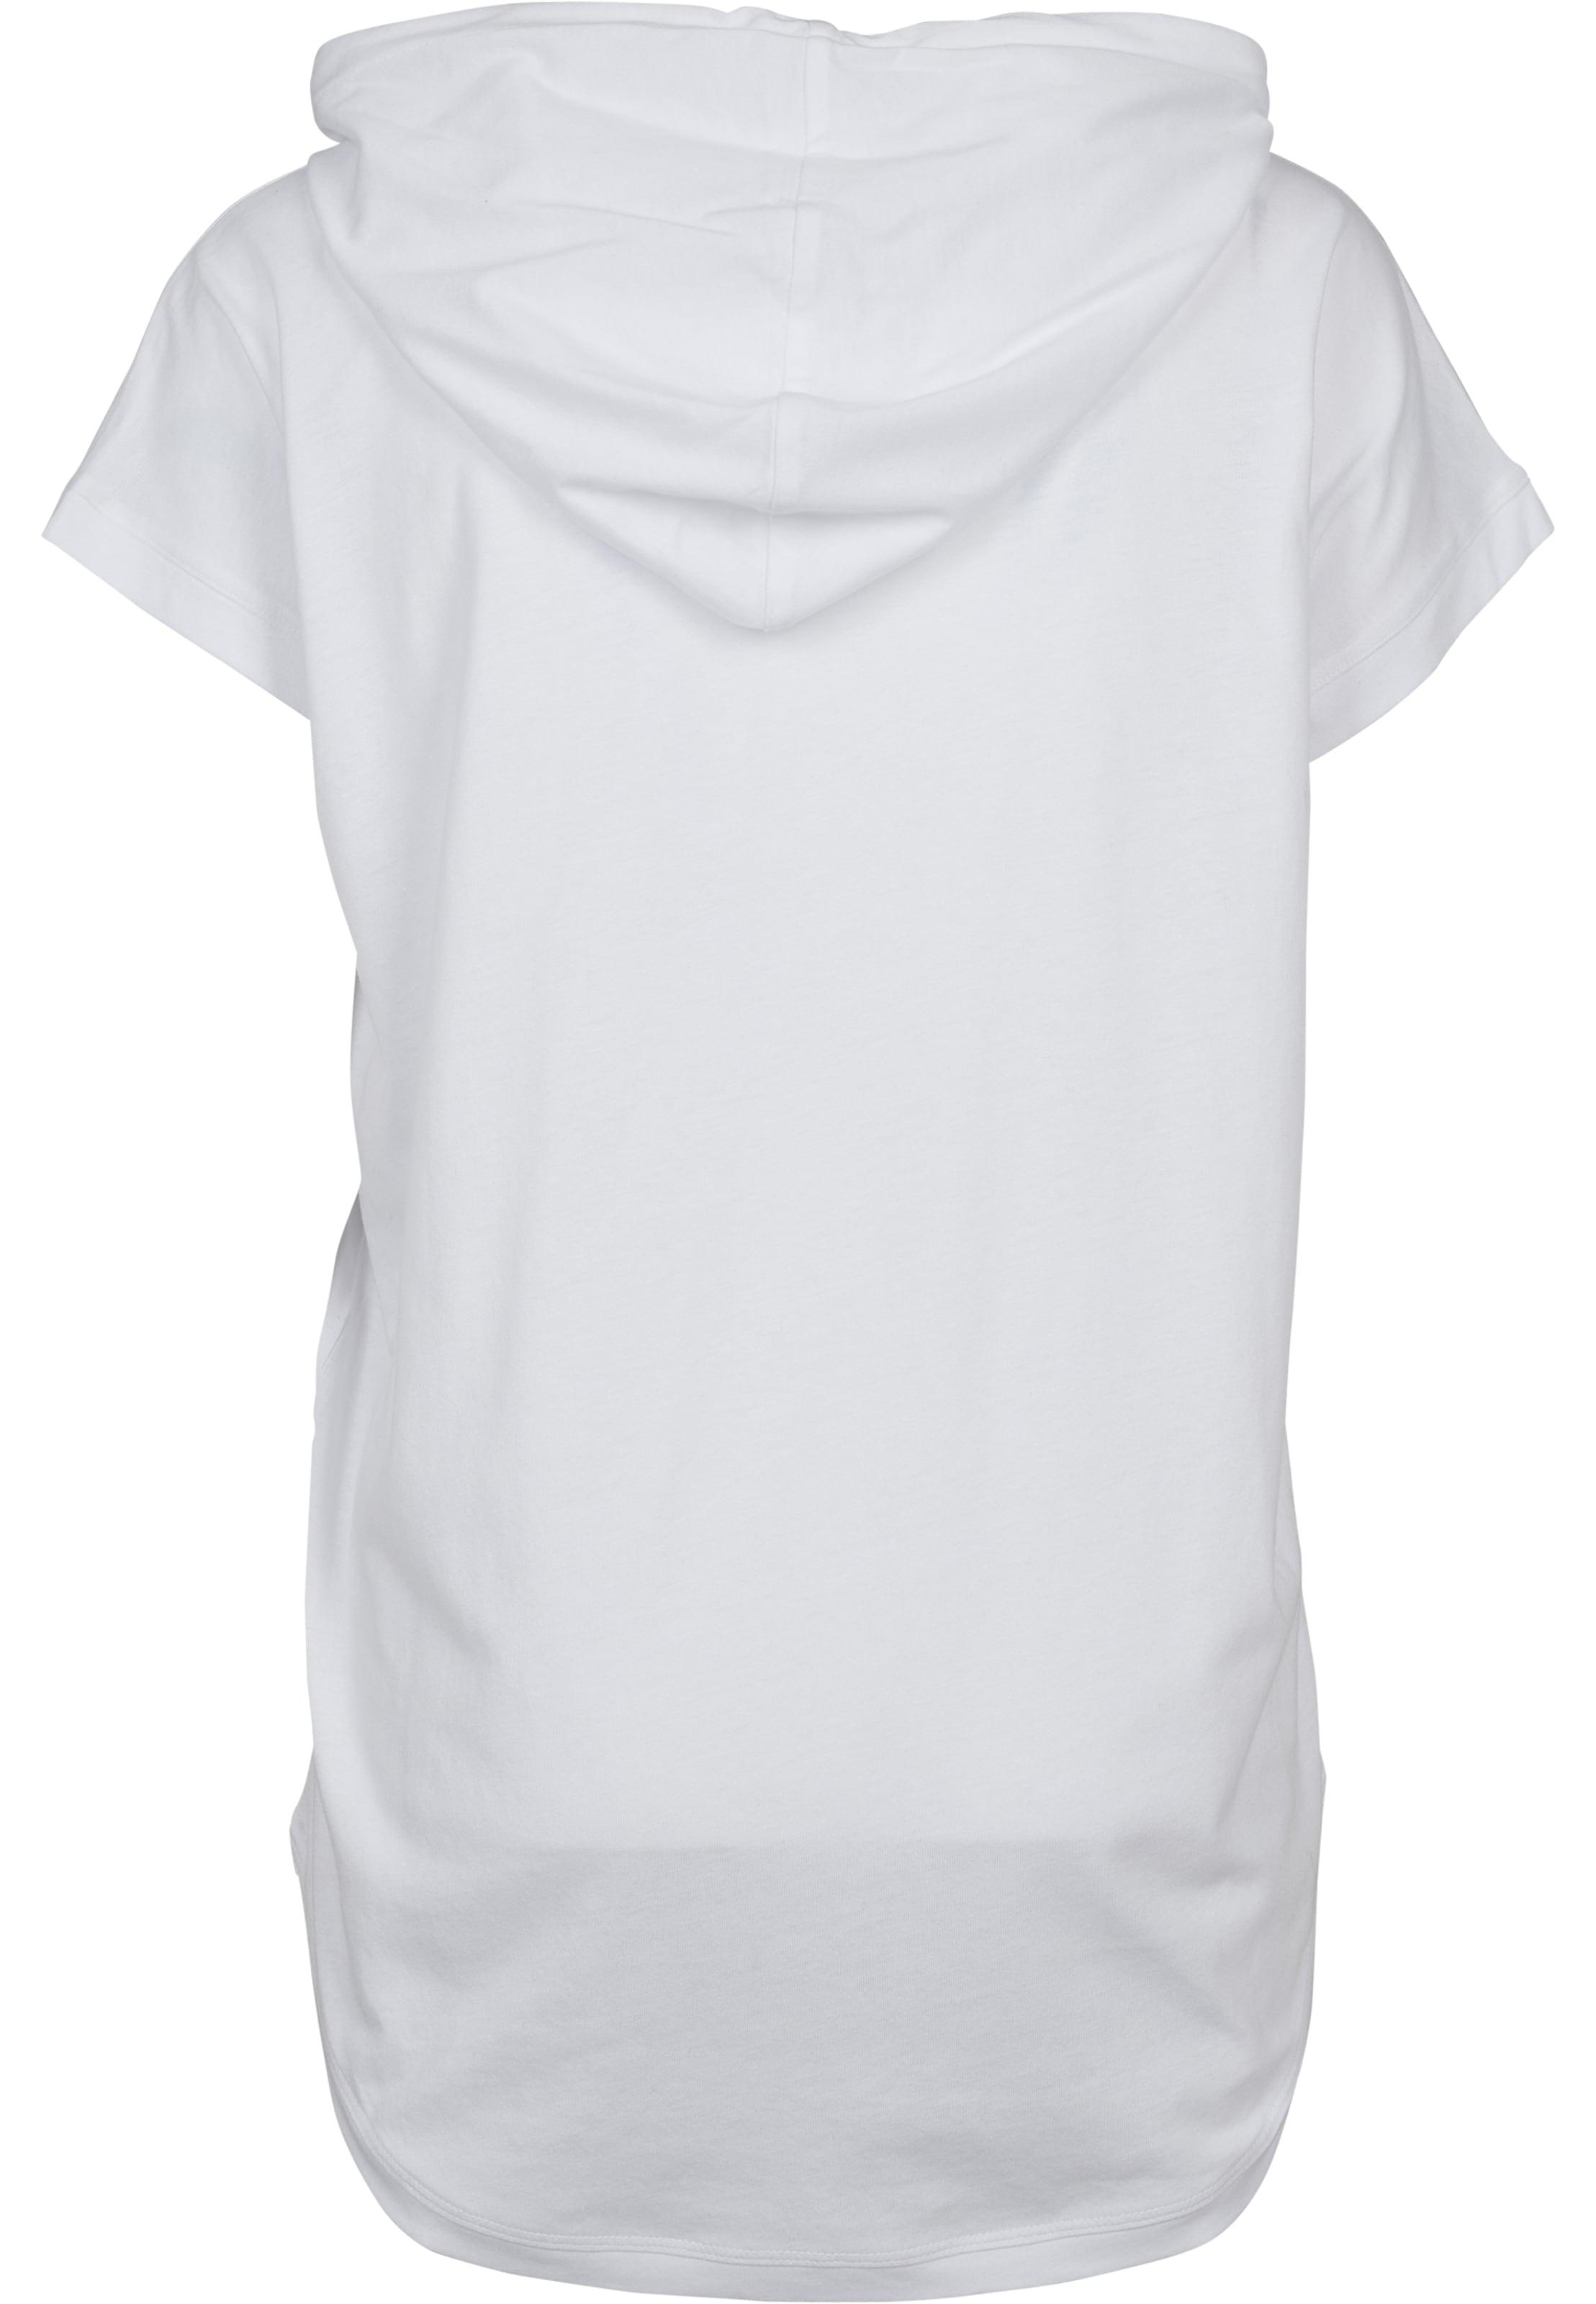 In Weiß Shirt Curvy Classics Urban UMVGqSzp